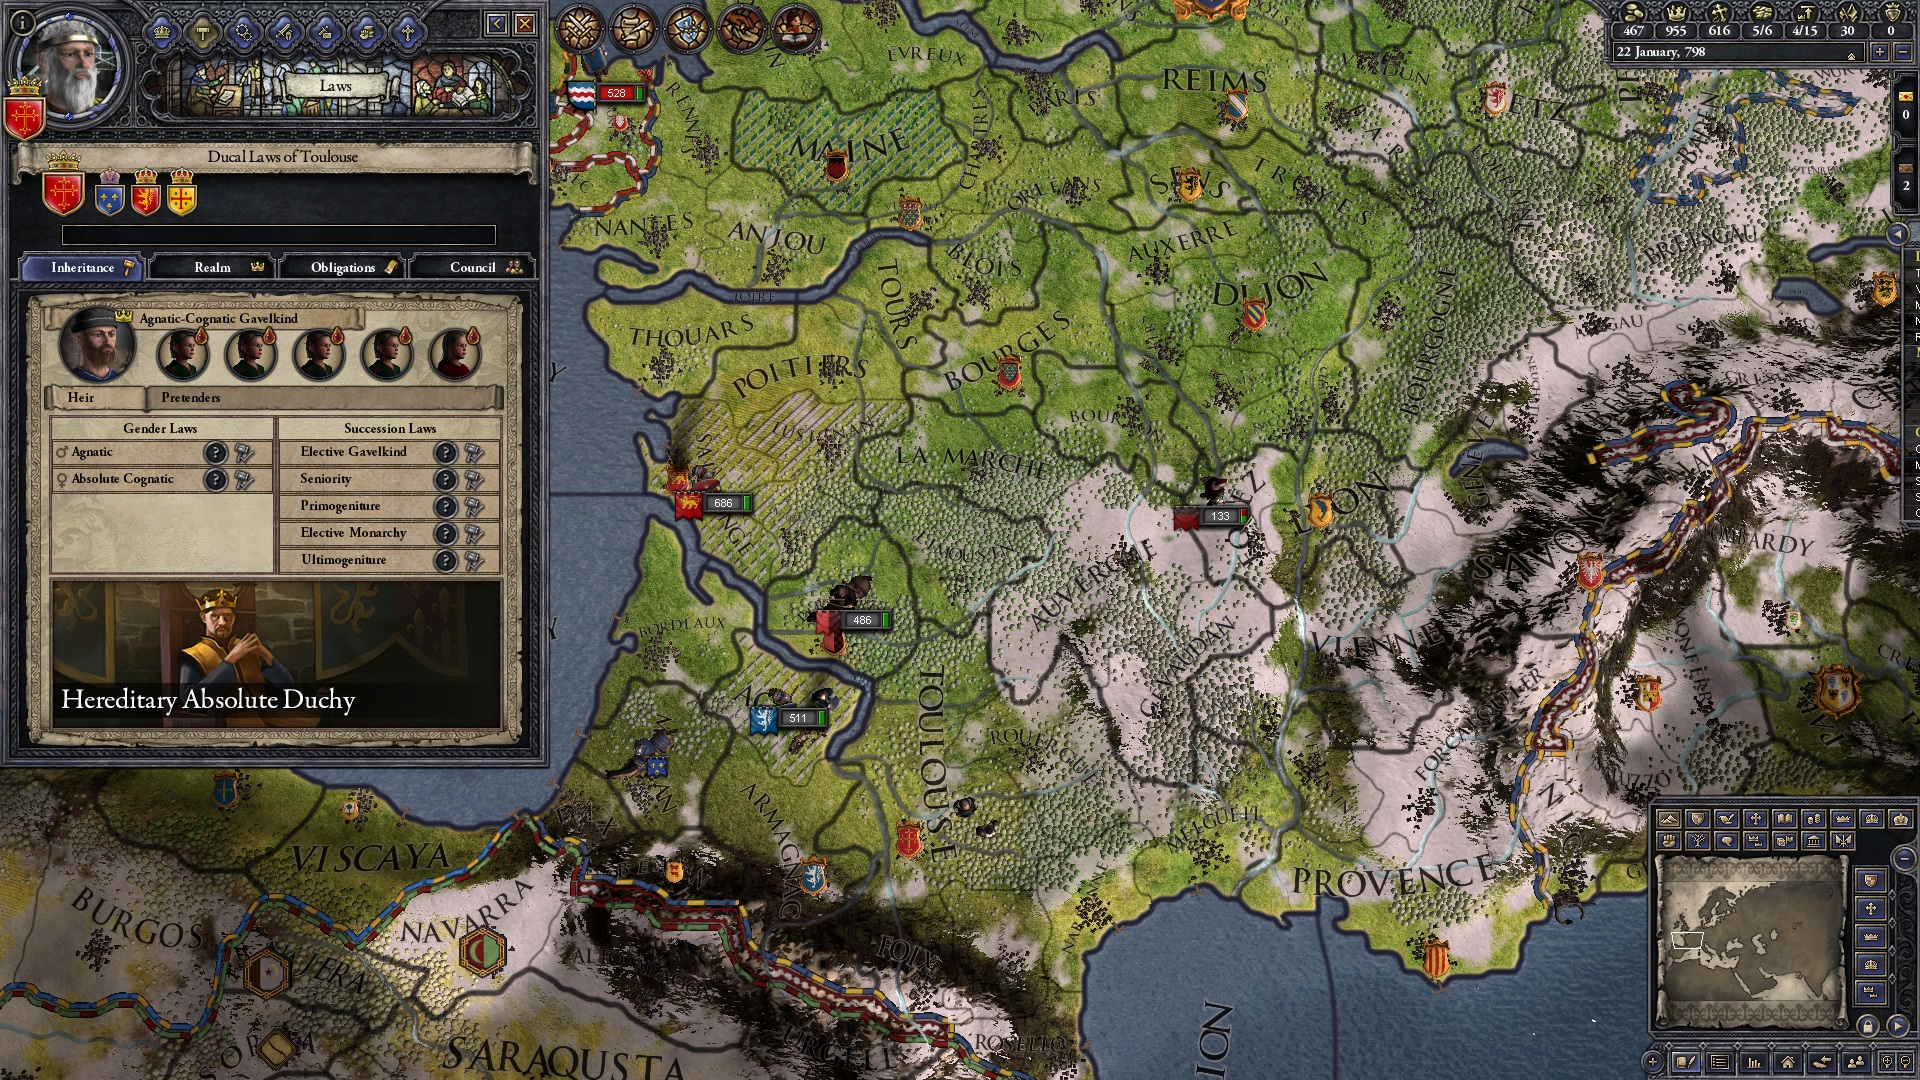 Expansion - crusader kings ii: sons of abraham download free